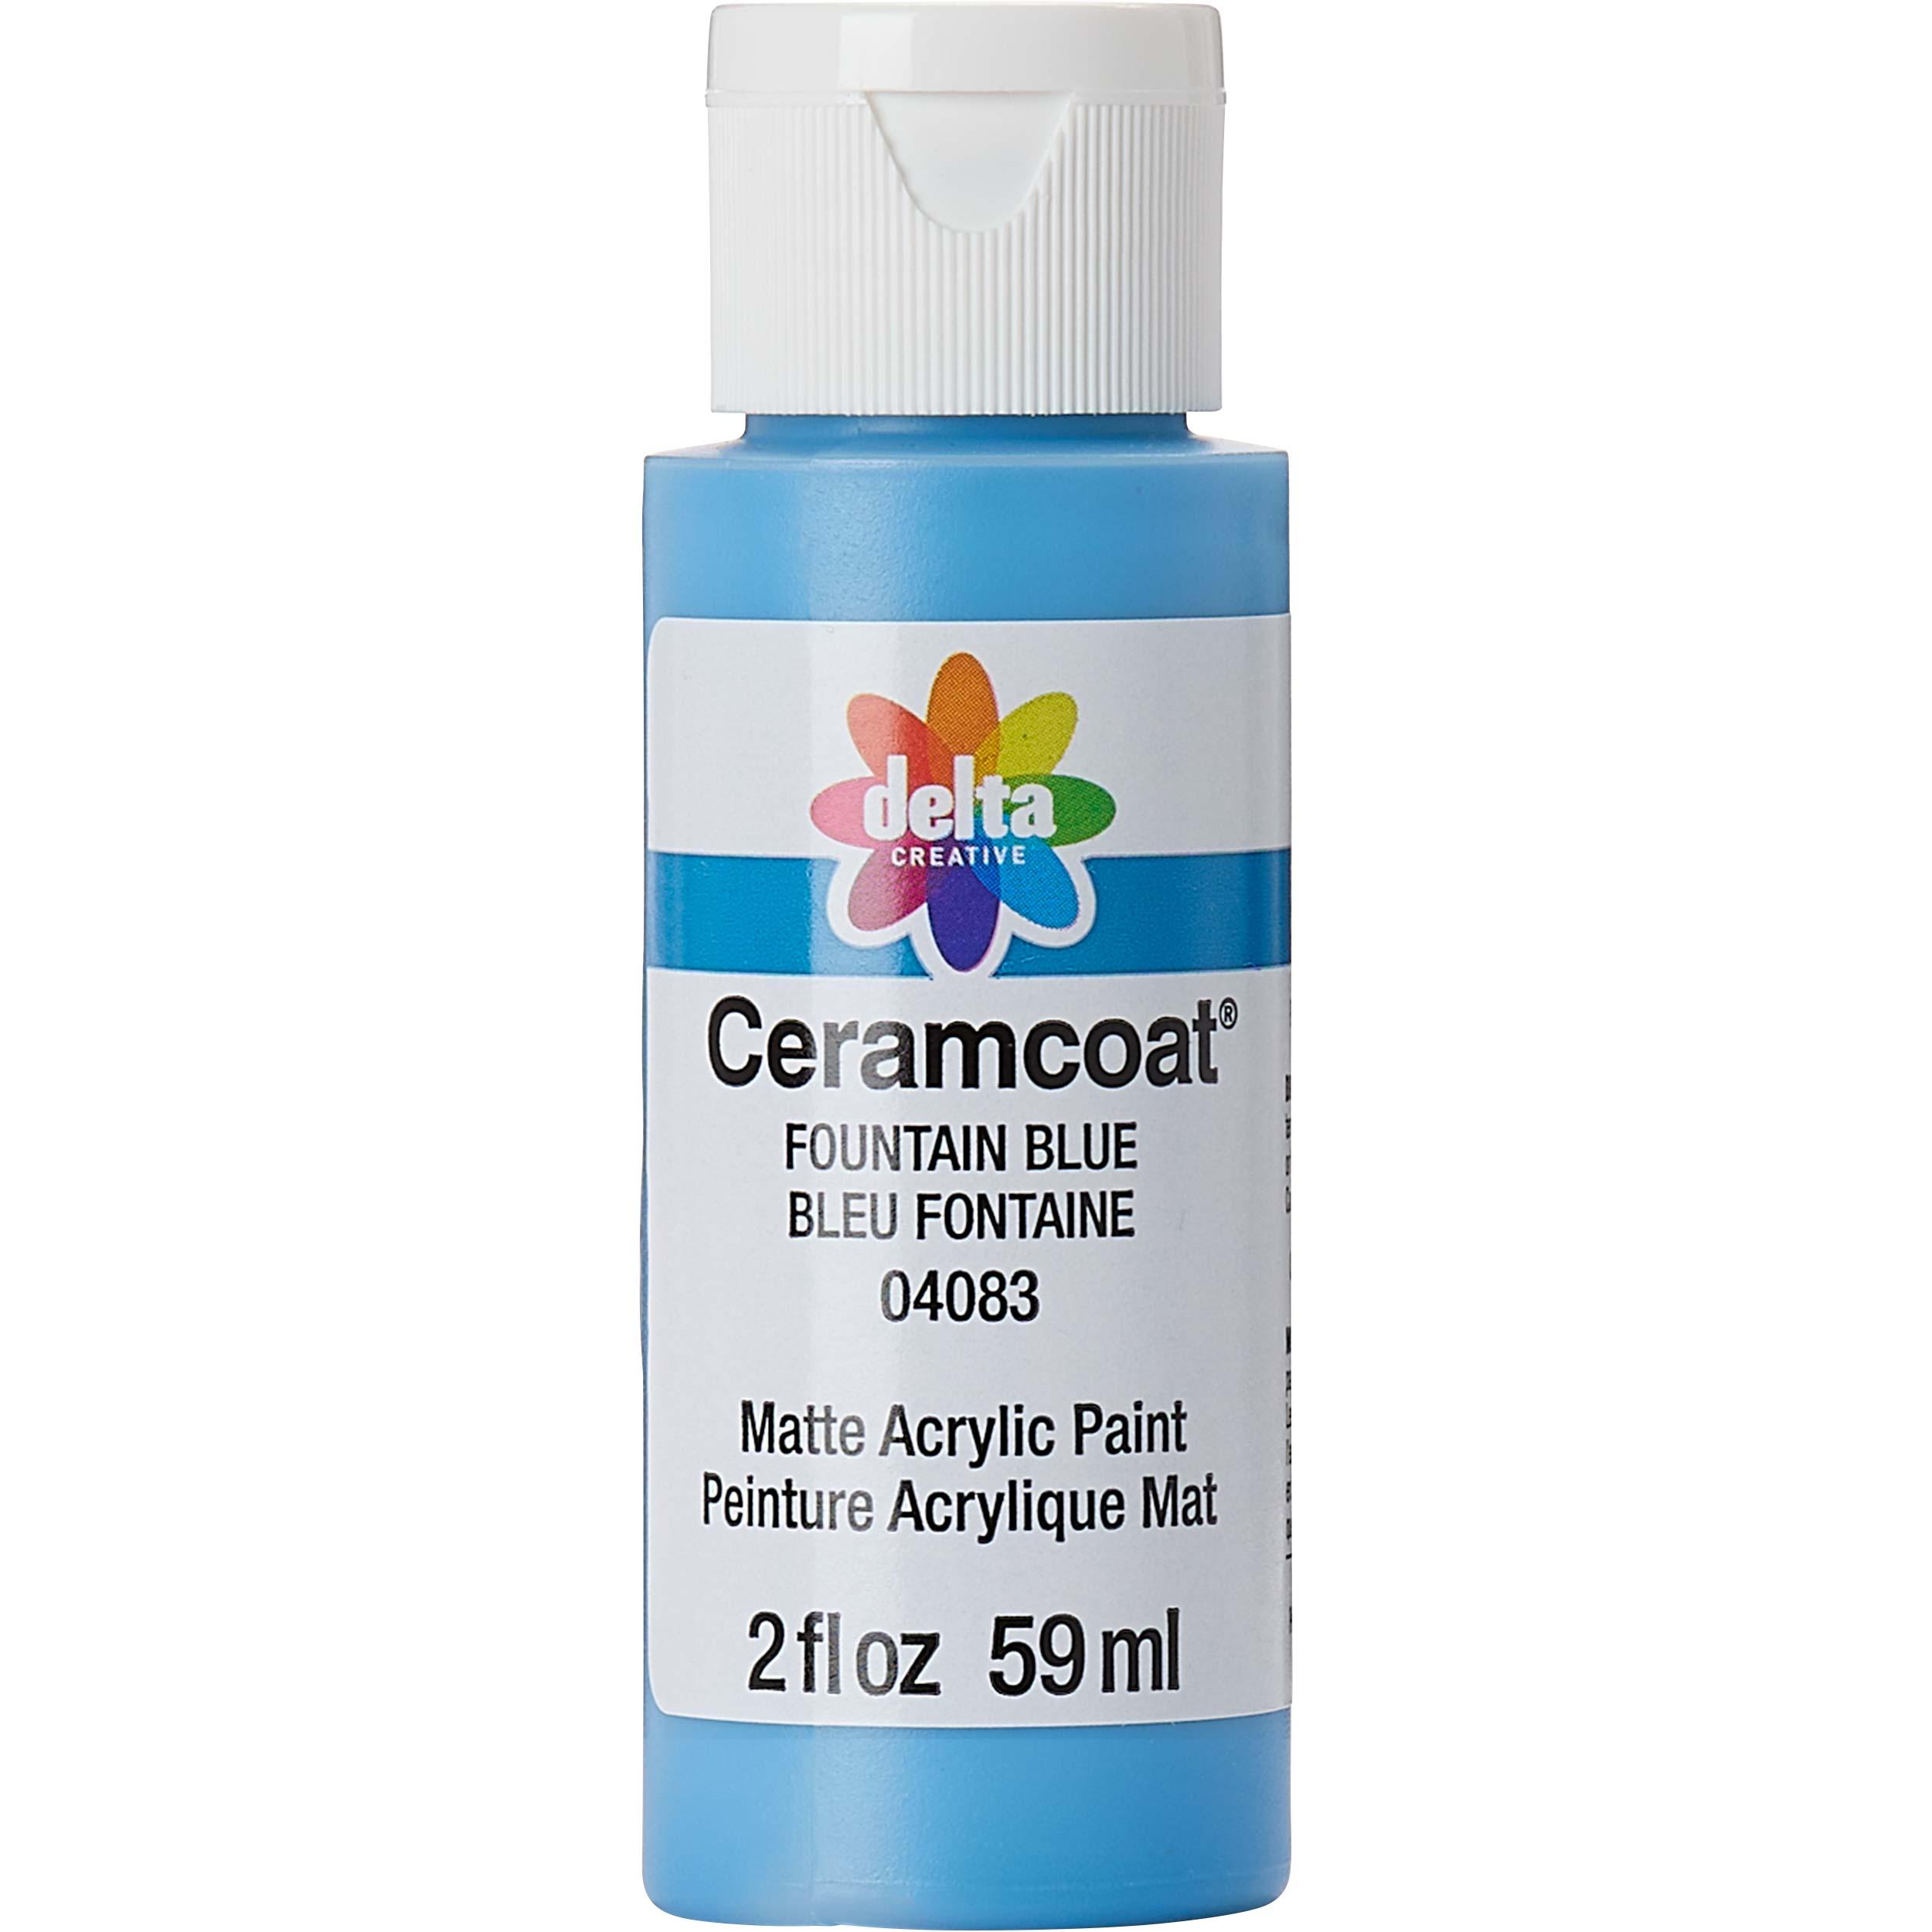 Delta Ceramcoat ® Acrylic Paint - Fountain Blue, 2 oz.